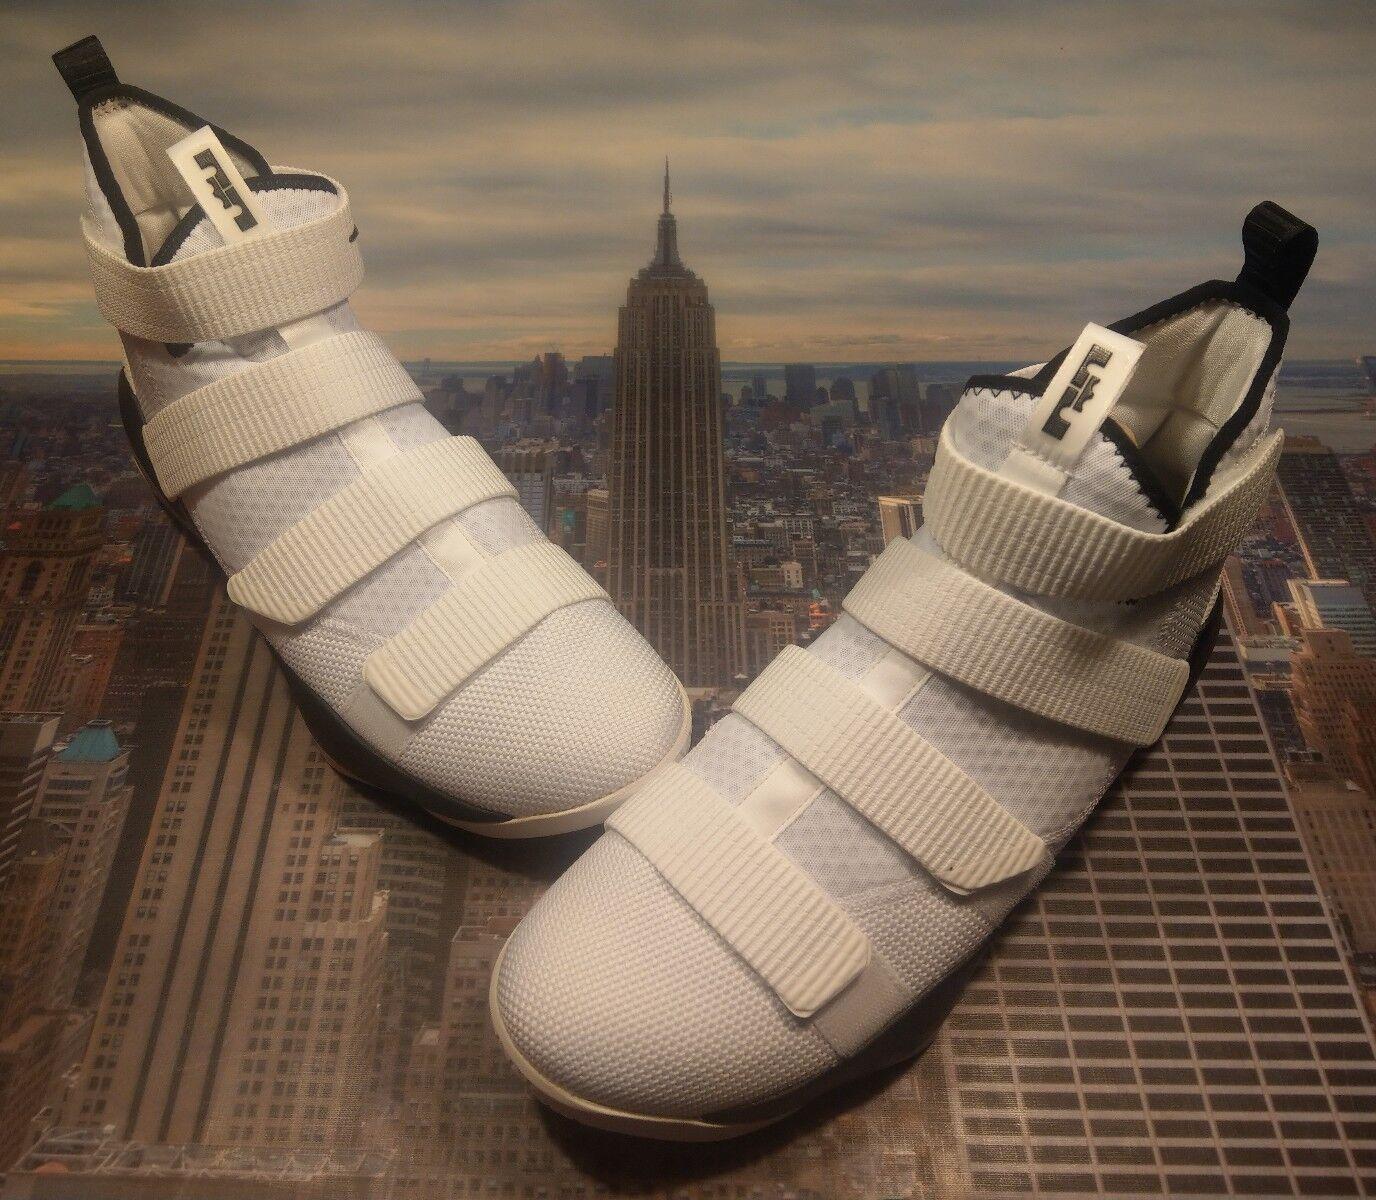 Nike lebron soldat xi 11 tb promo  / / / silber schwarz 14 943155 106 neuen 3ddbf2